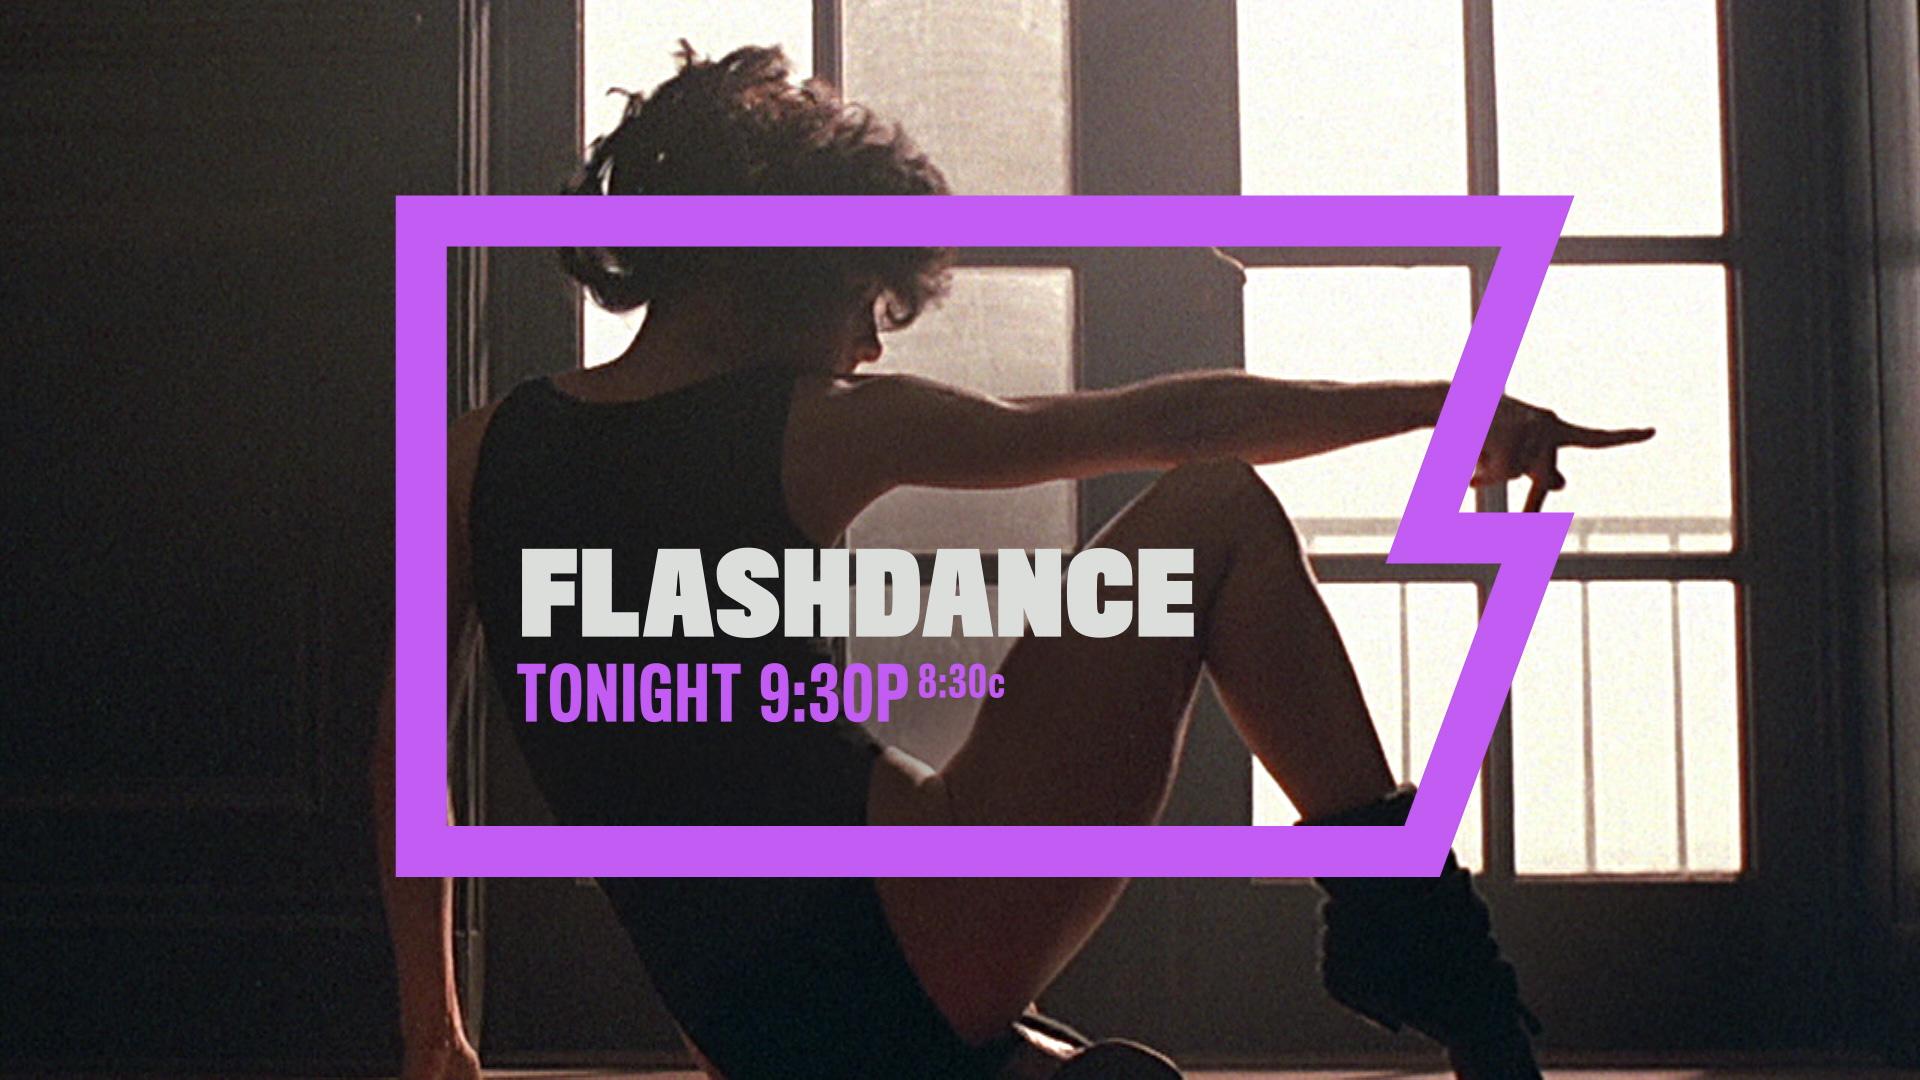 Flashdance_EP_02.jpg